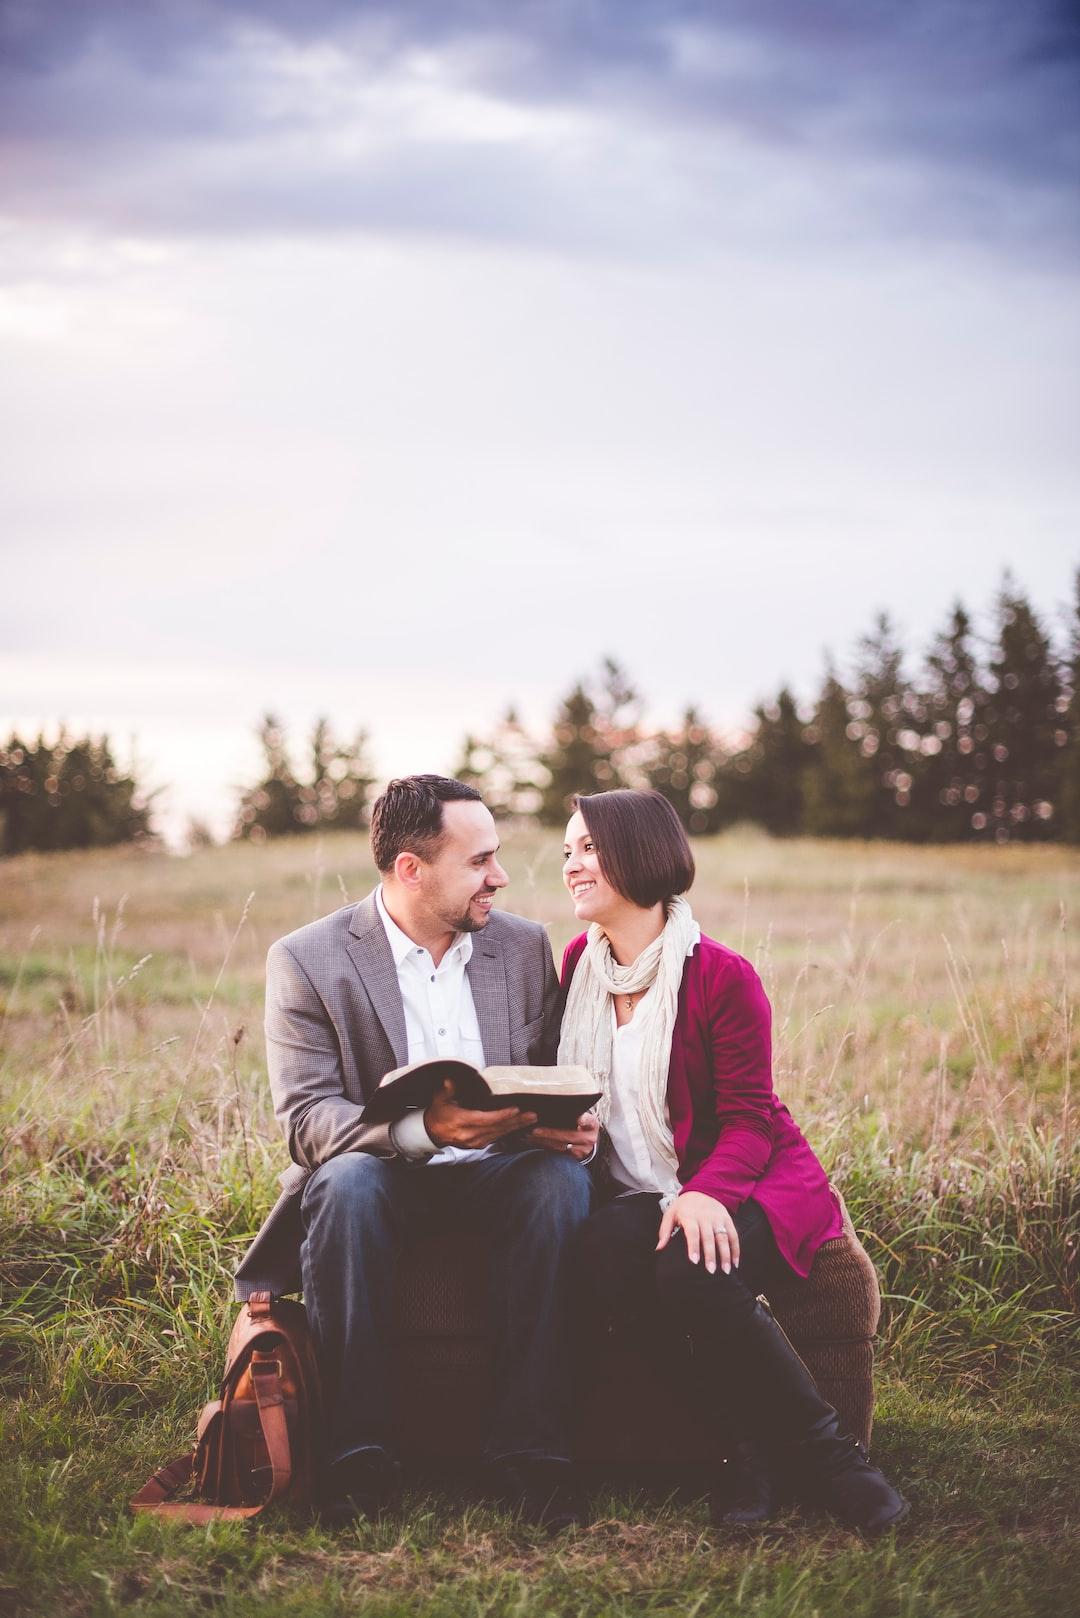 Book couple on ottoman